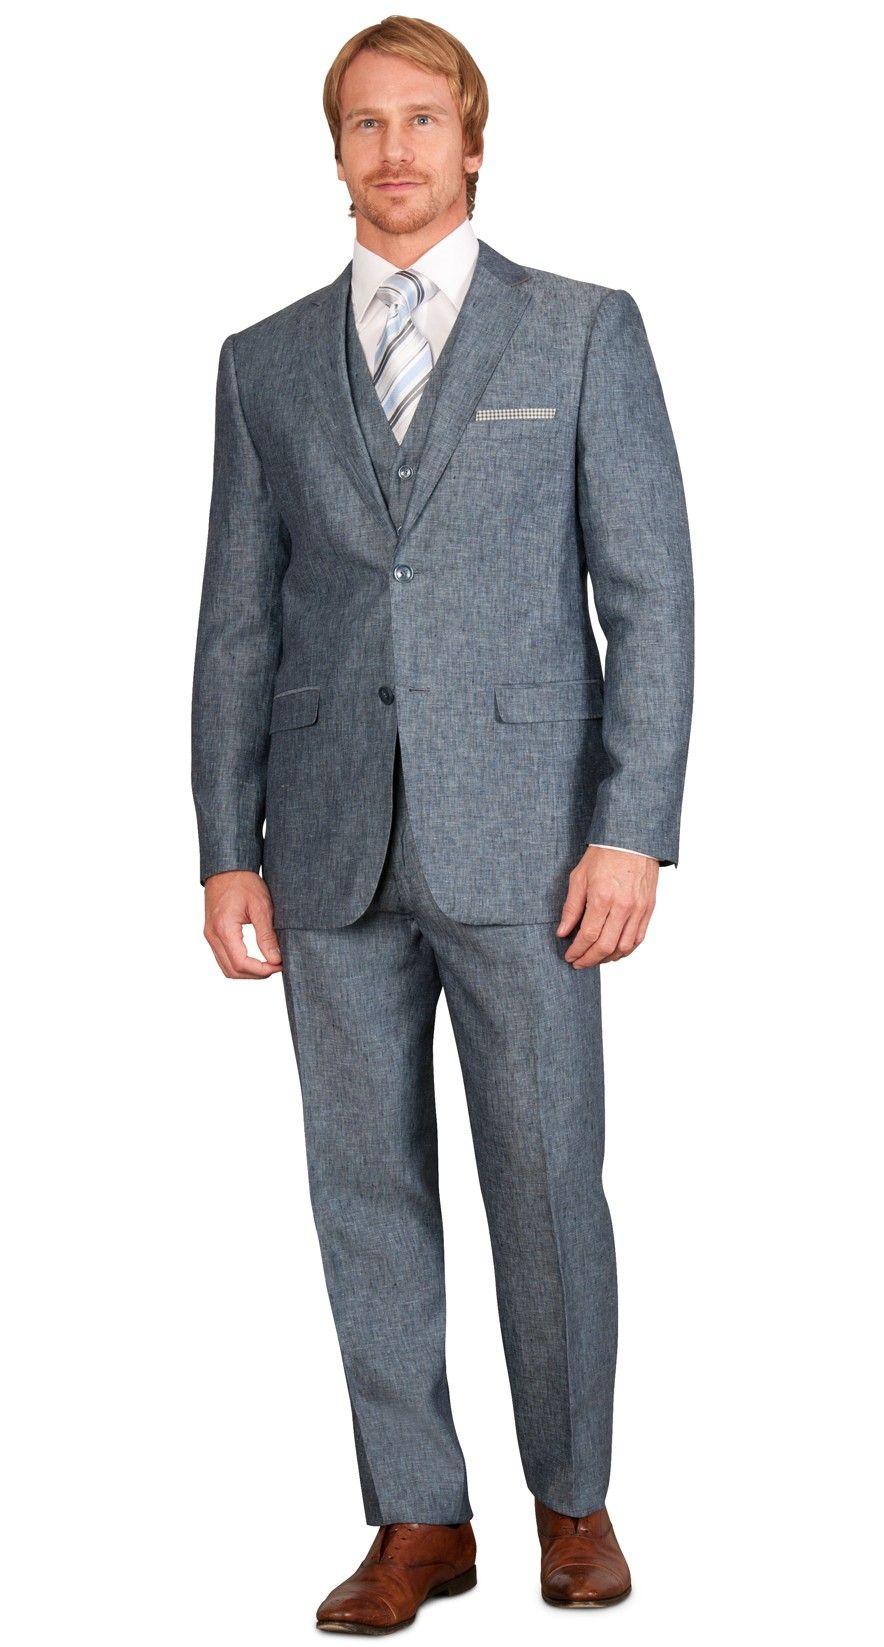 Chambray 2 Piece Slim Fit Linen Men's Suit -Dark Blue $298.00 ...